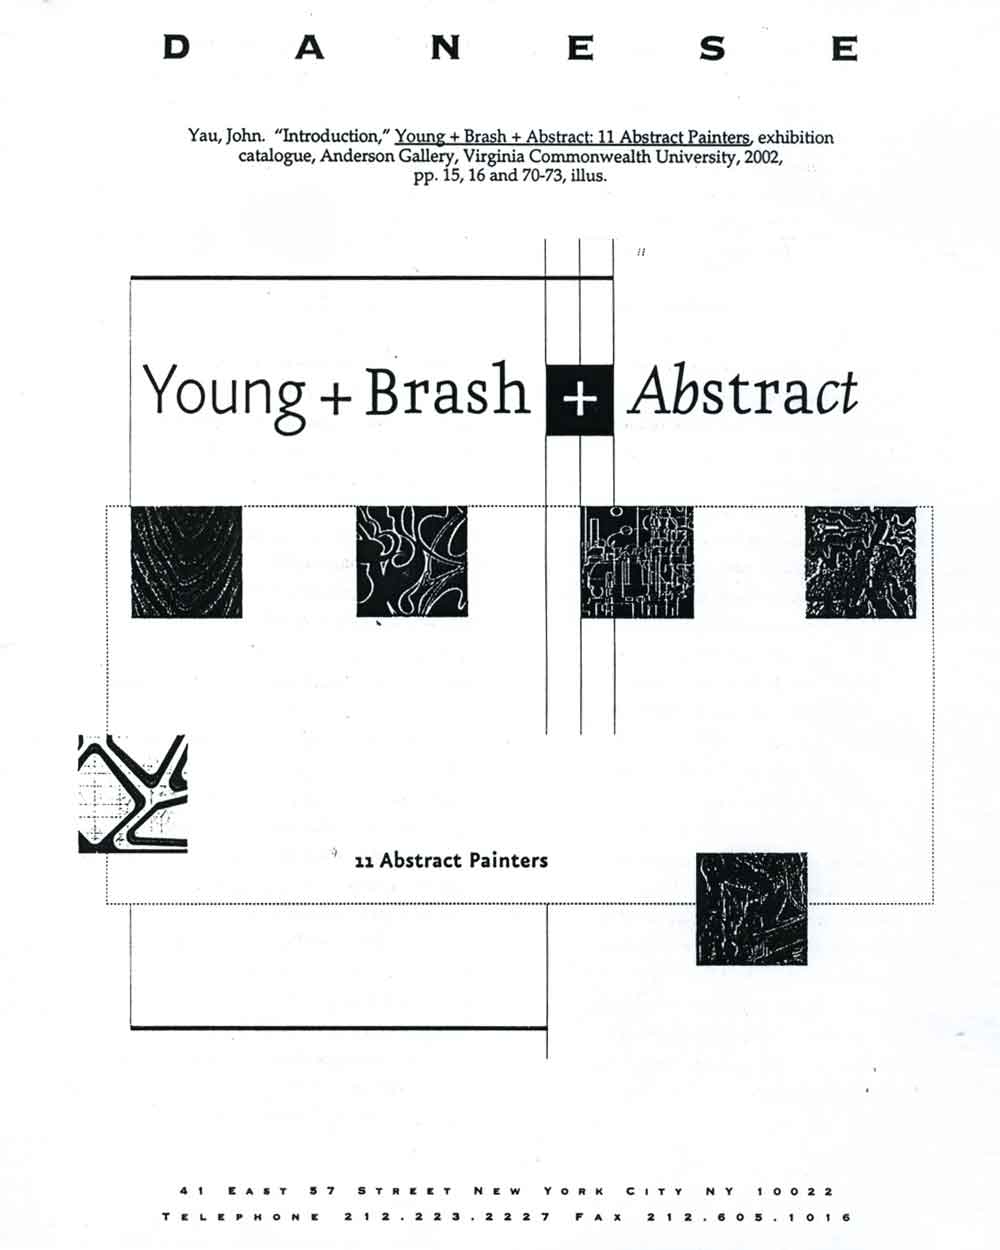 Introduction by John Yau, pg 1